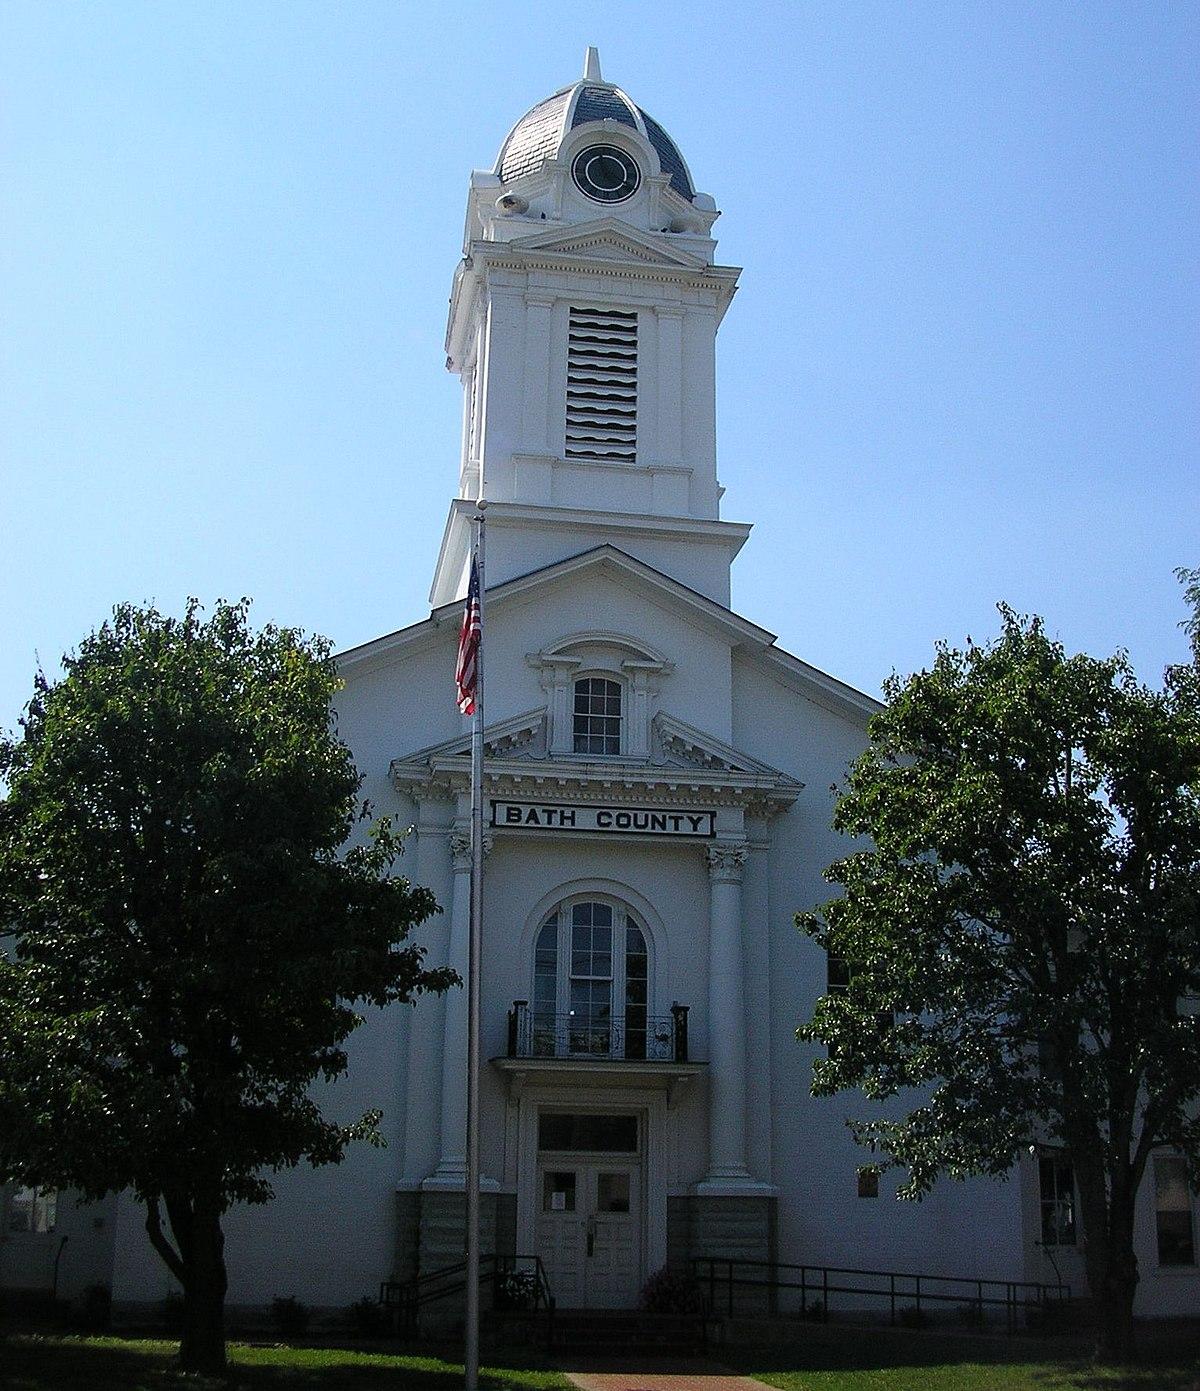 Bath County, Kentucky - Wikipedia